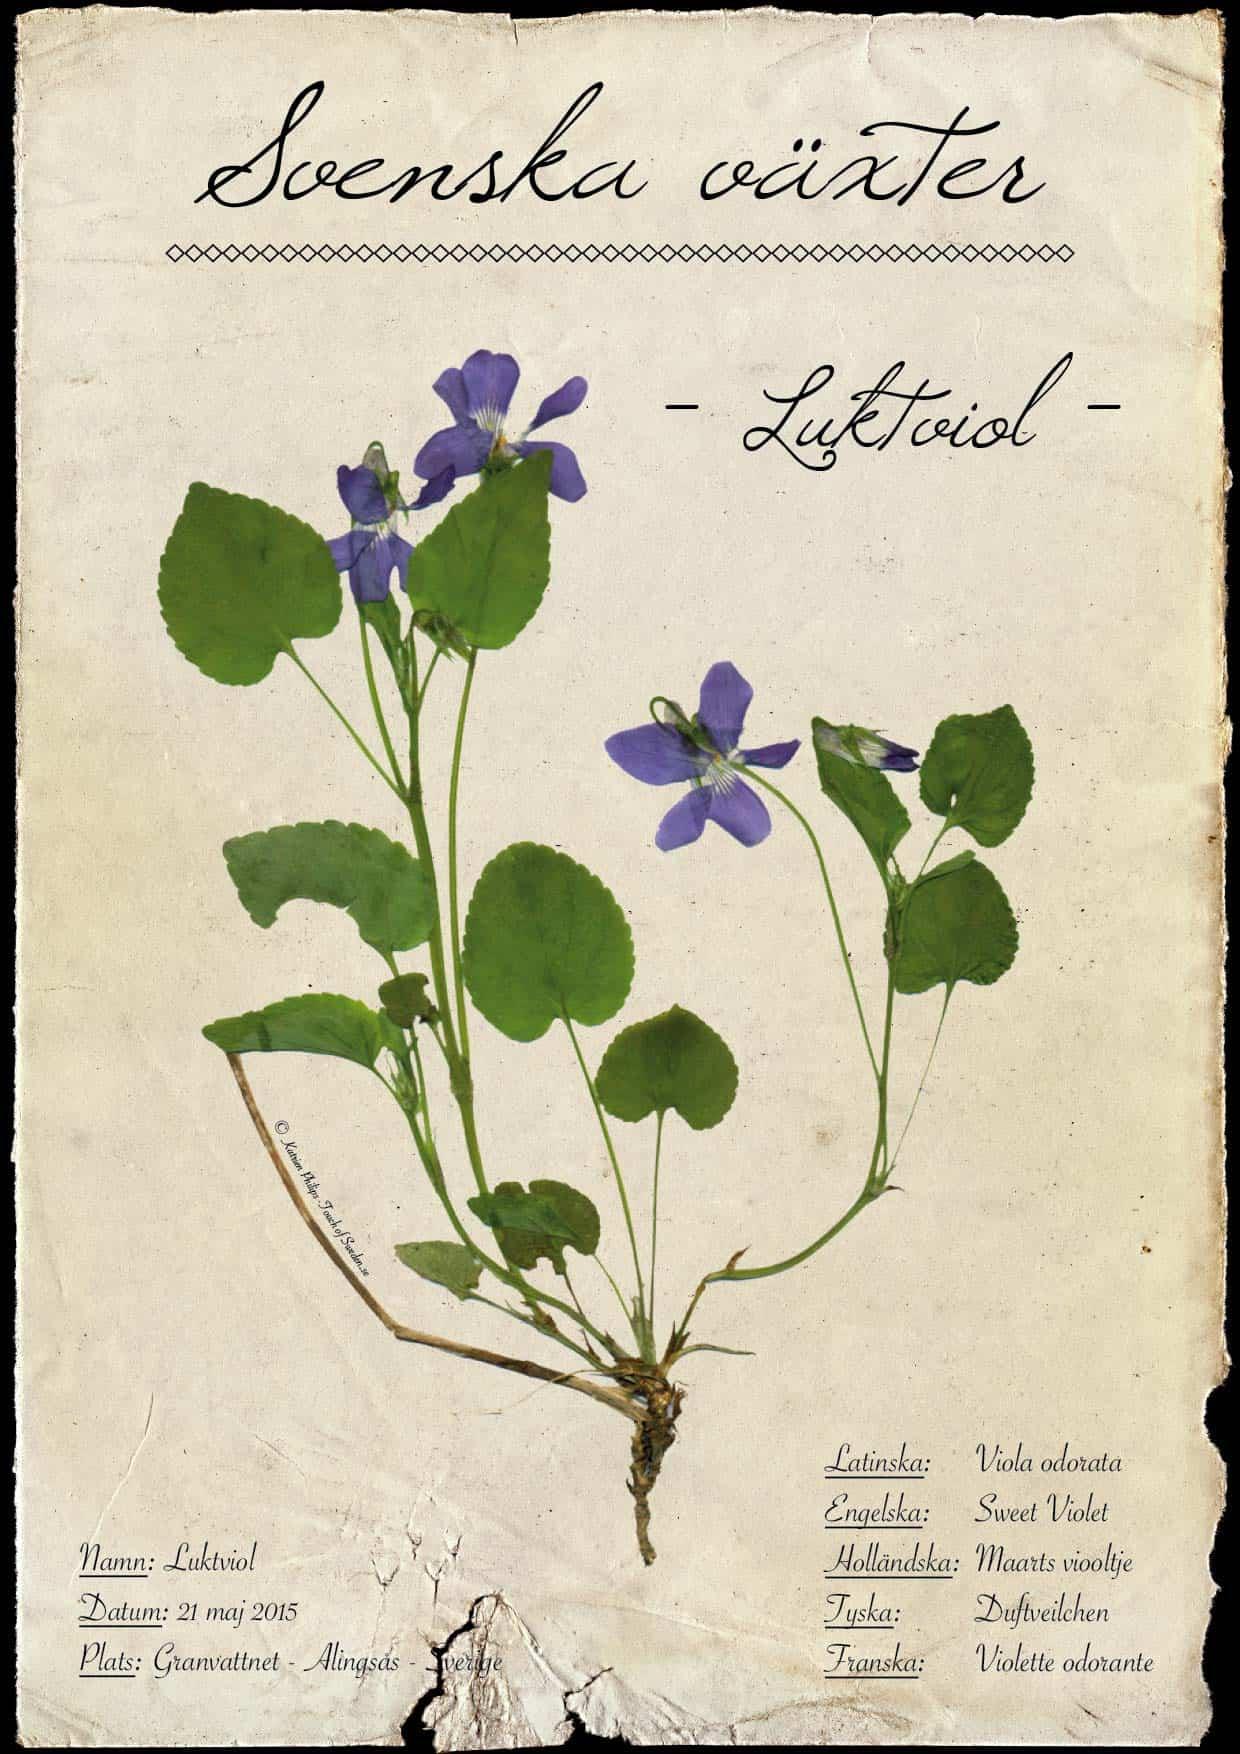 Herbarium maarts viooltje